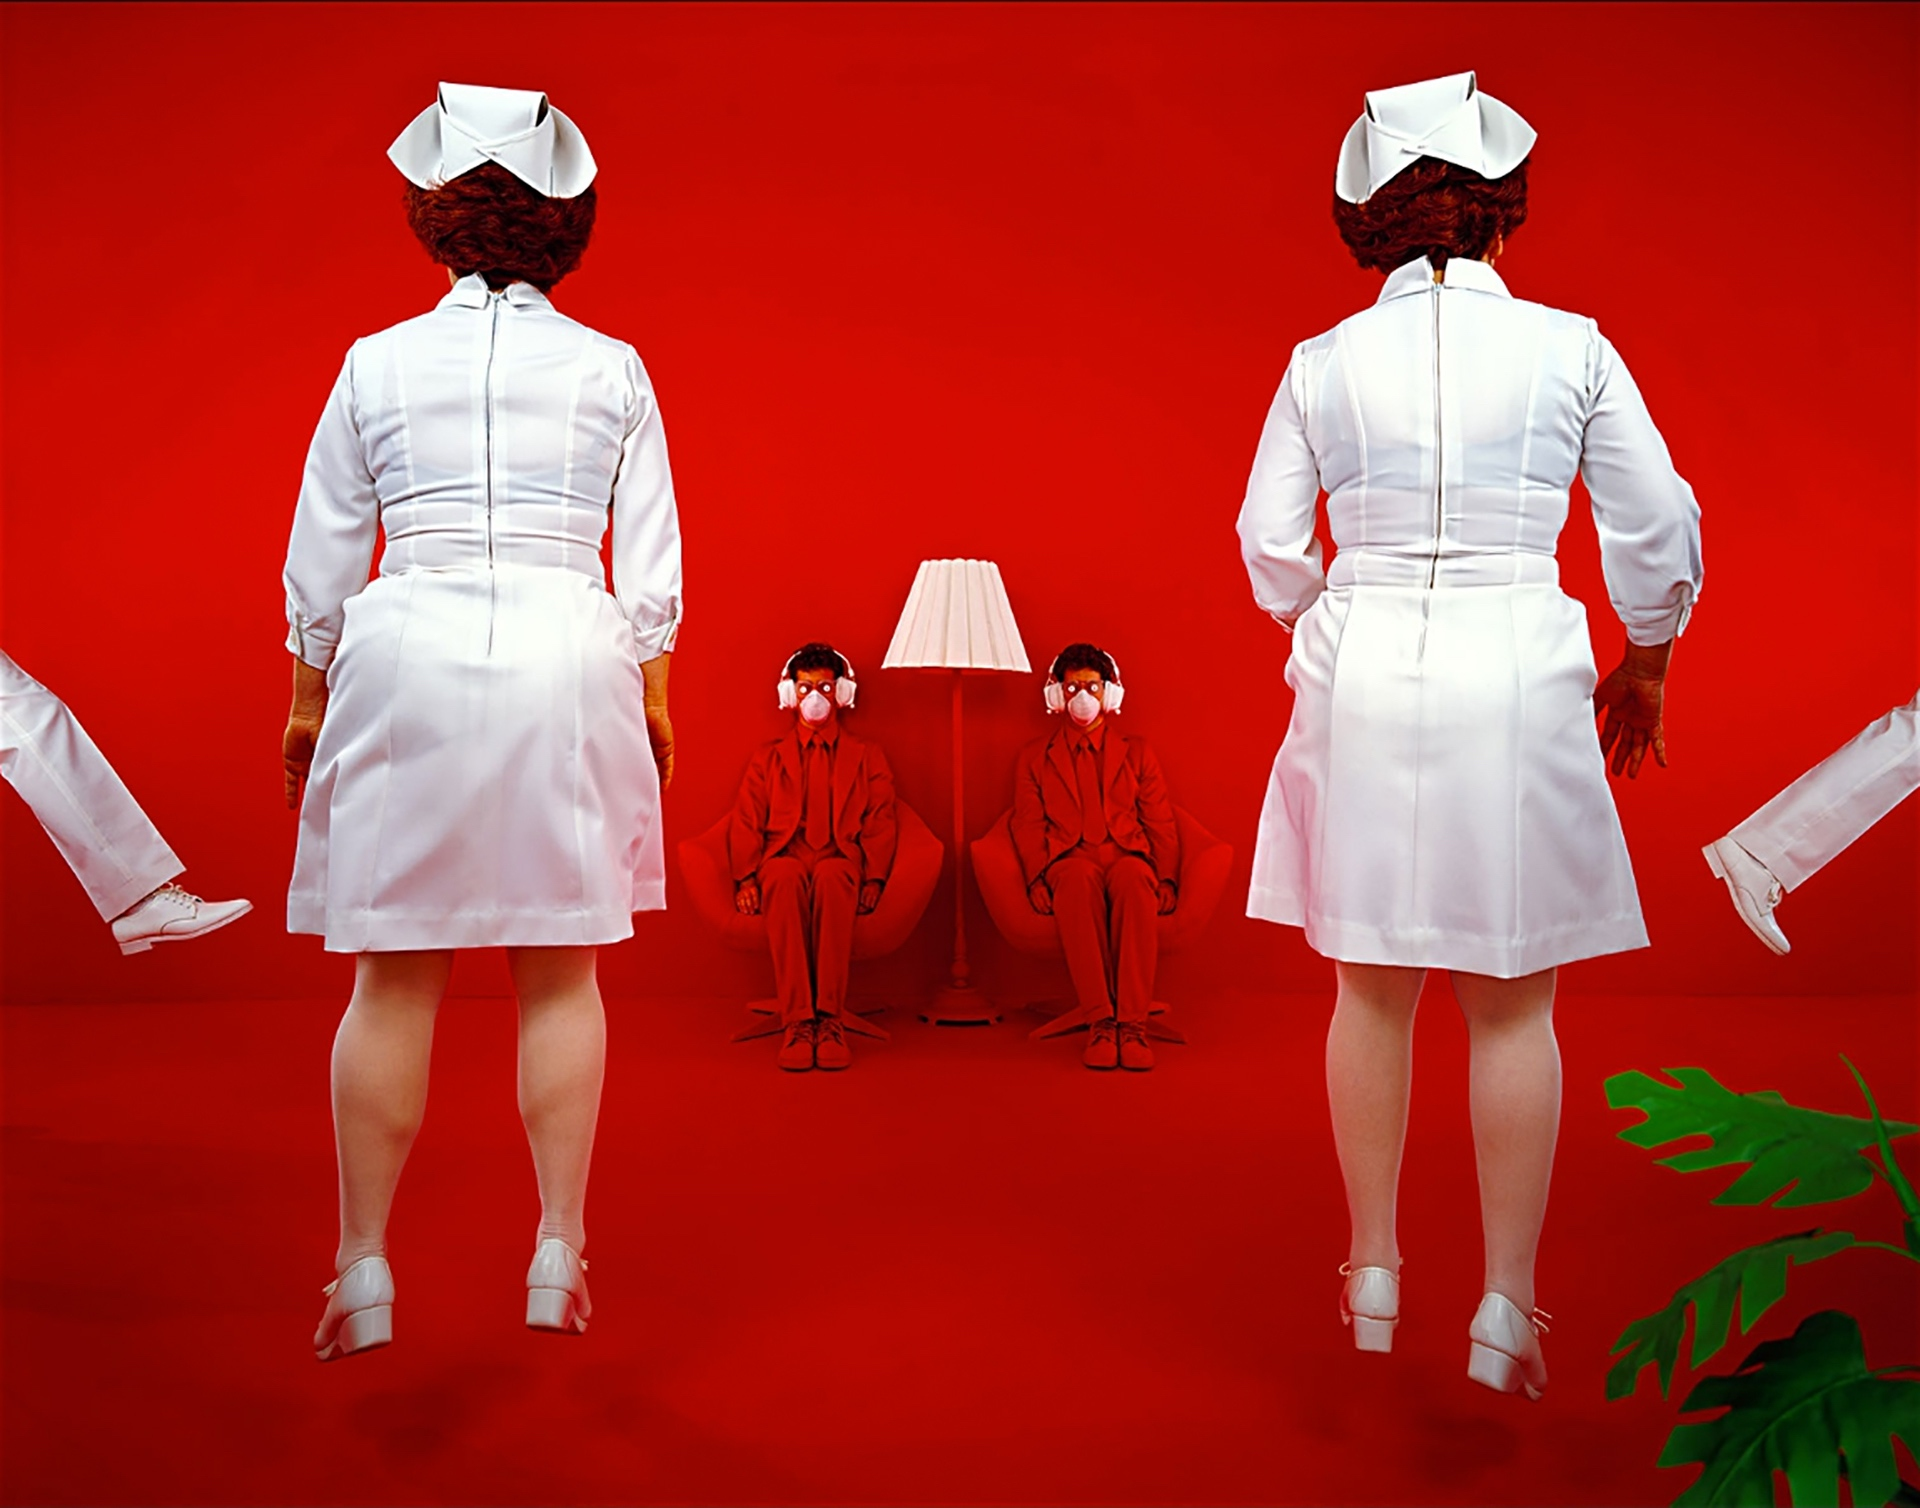 Patients and Nurses(1982) by Sandy Skoglund - Pako Campo